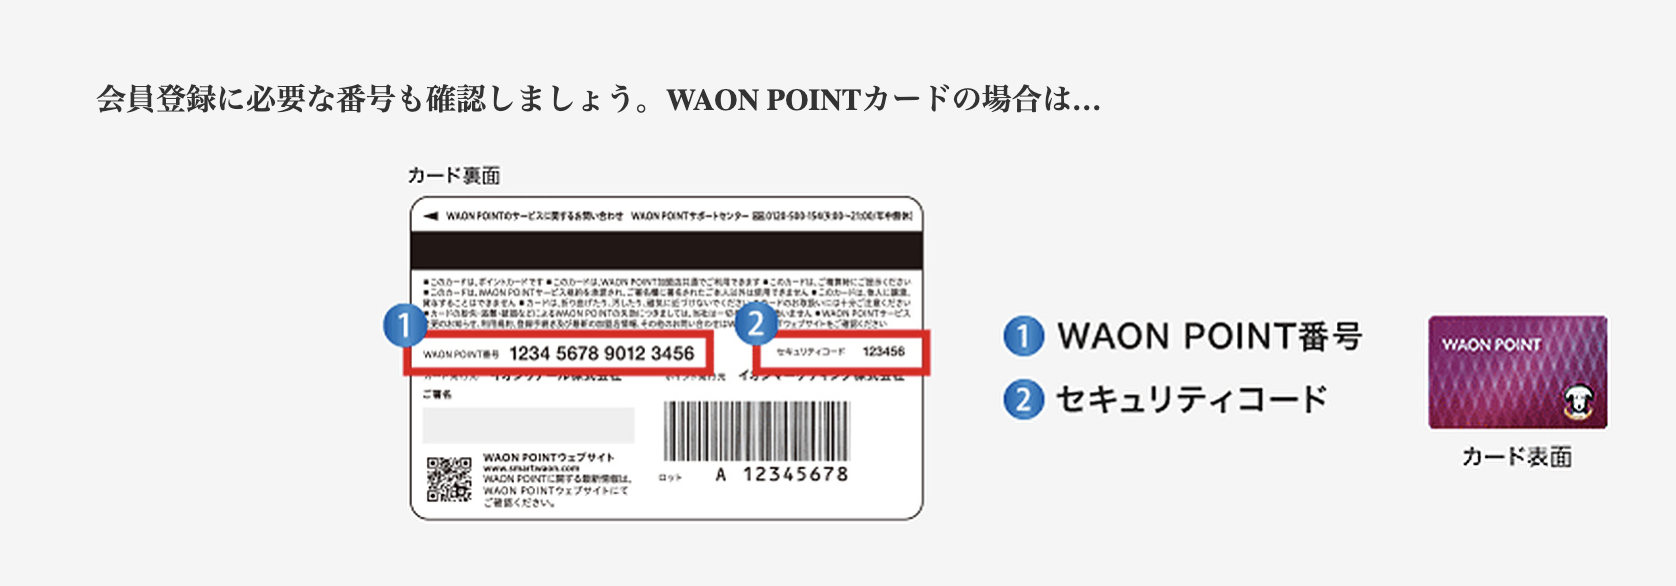 WAON POINTの会員ウェブ登録